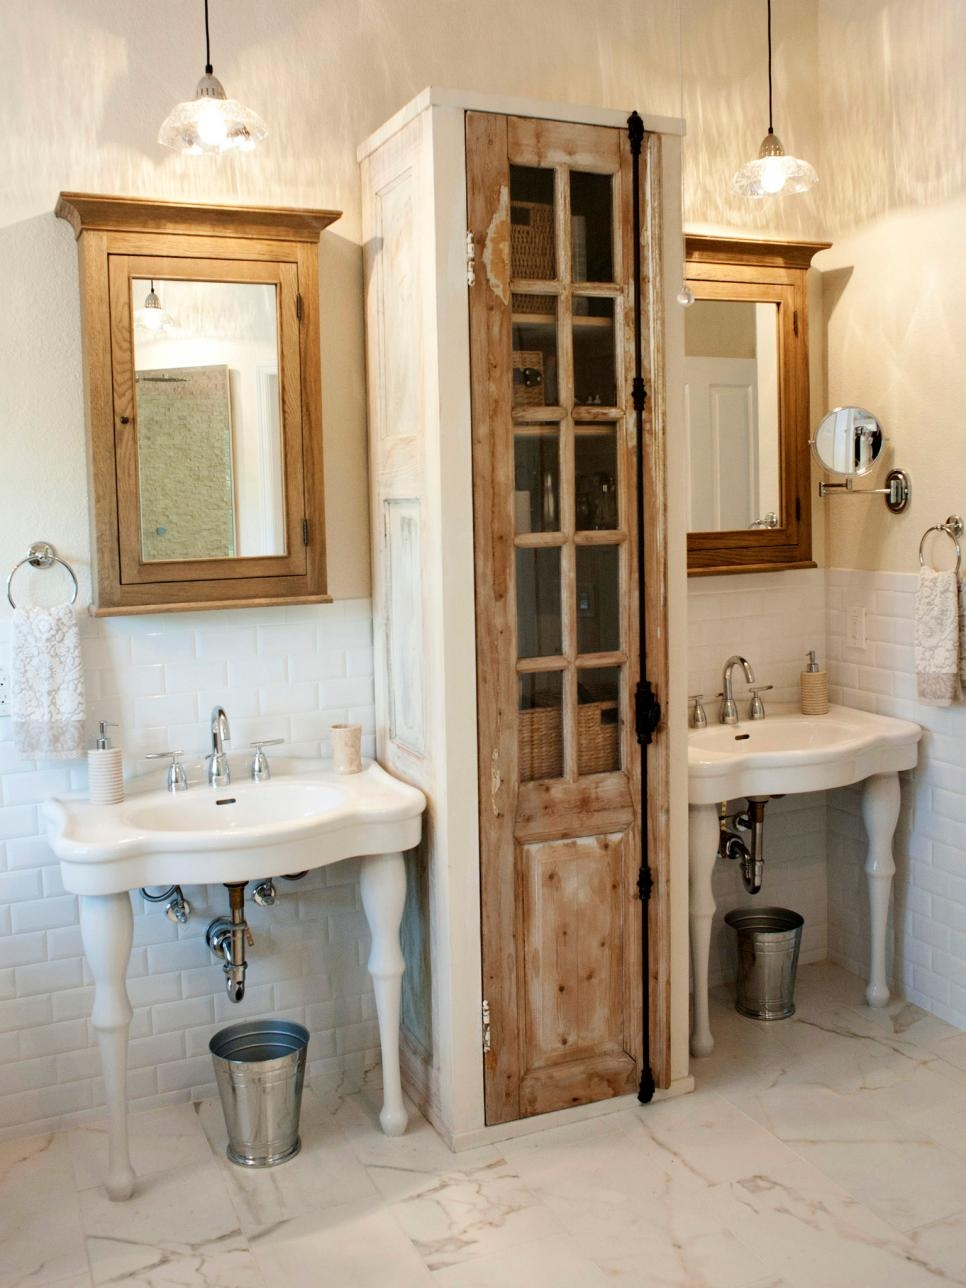 Vintage Bathroom Mirror With Shelf Creative Bathroom Decoration Pertaining To Vintage Style Bathroom Mirror (Image 11 of 15)